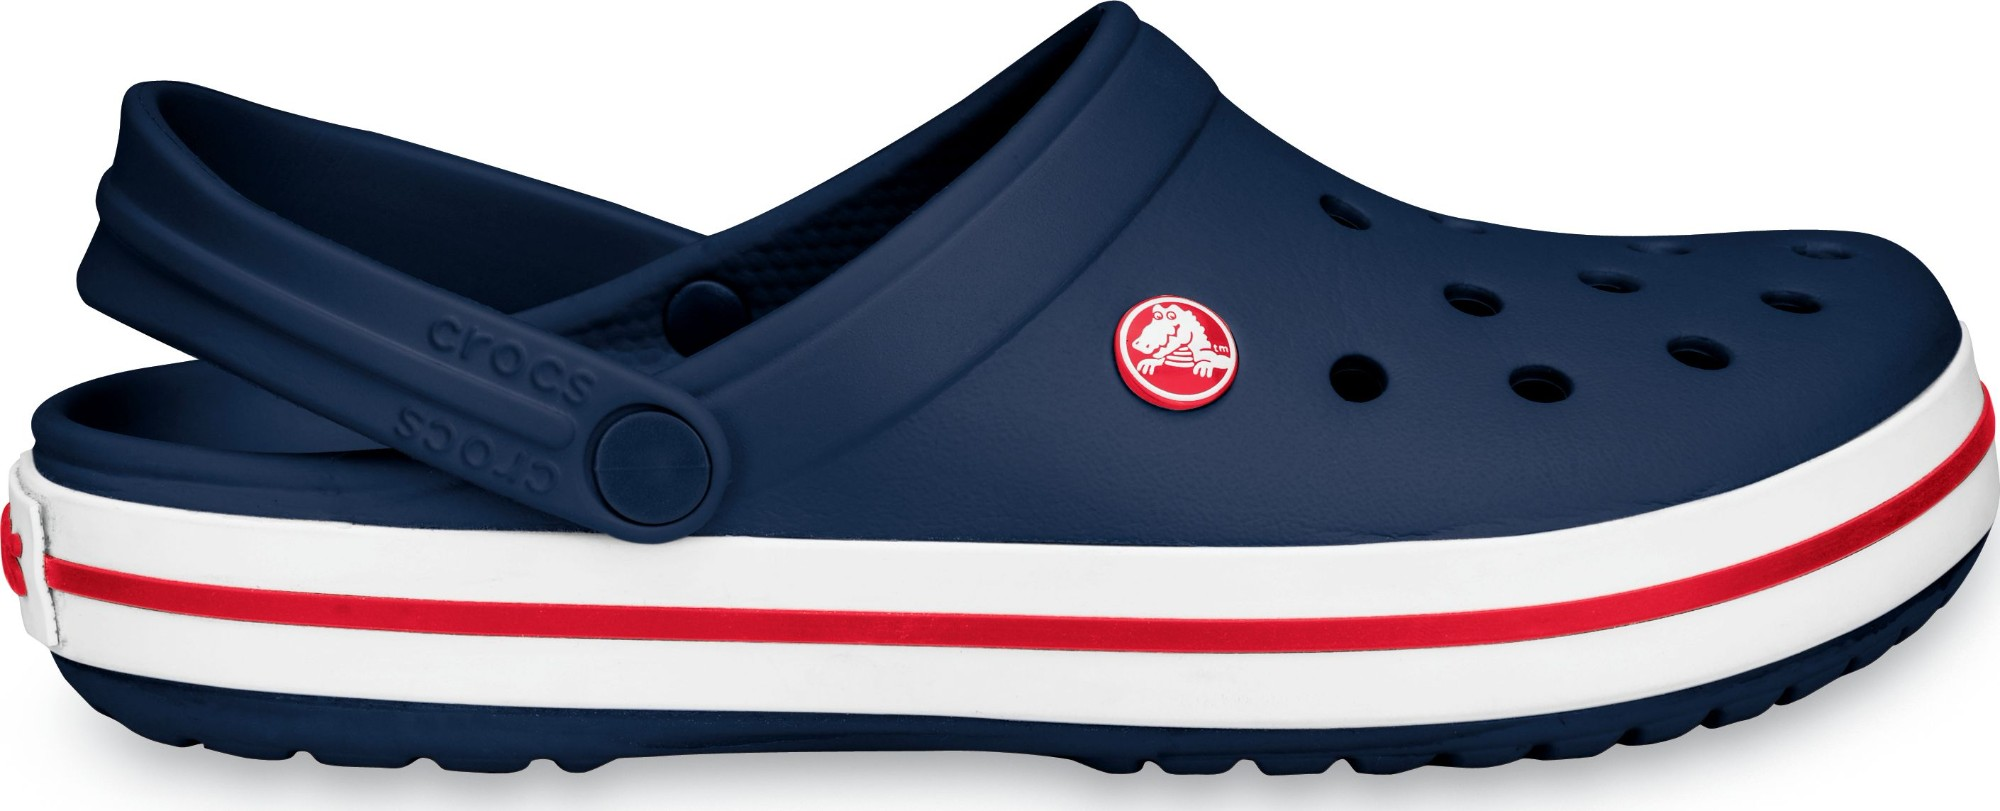 Crocs™ Crocband™ Navy 43,5